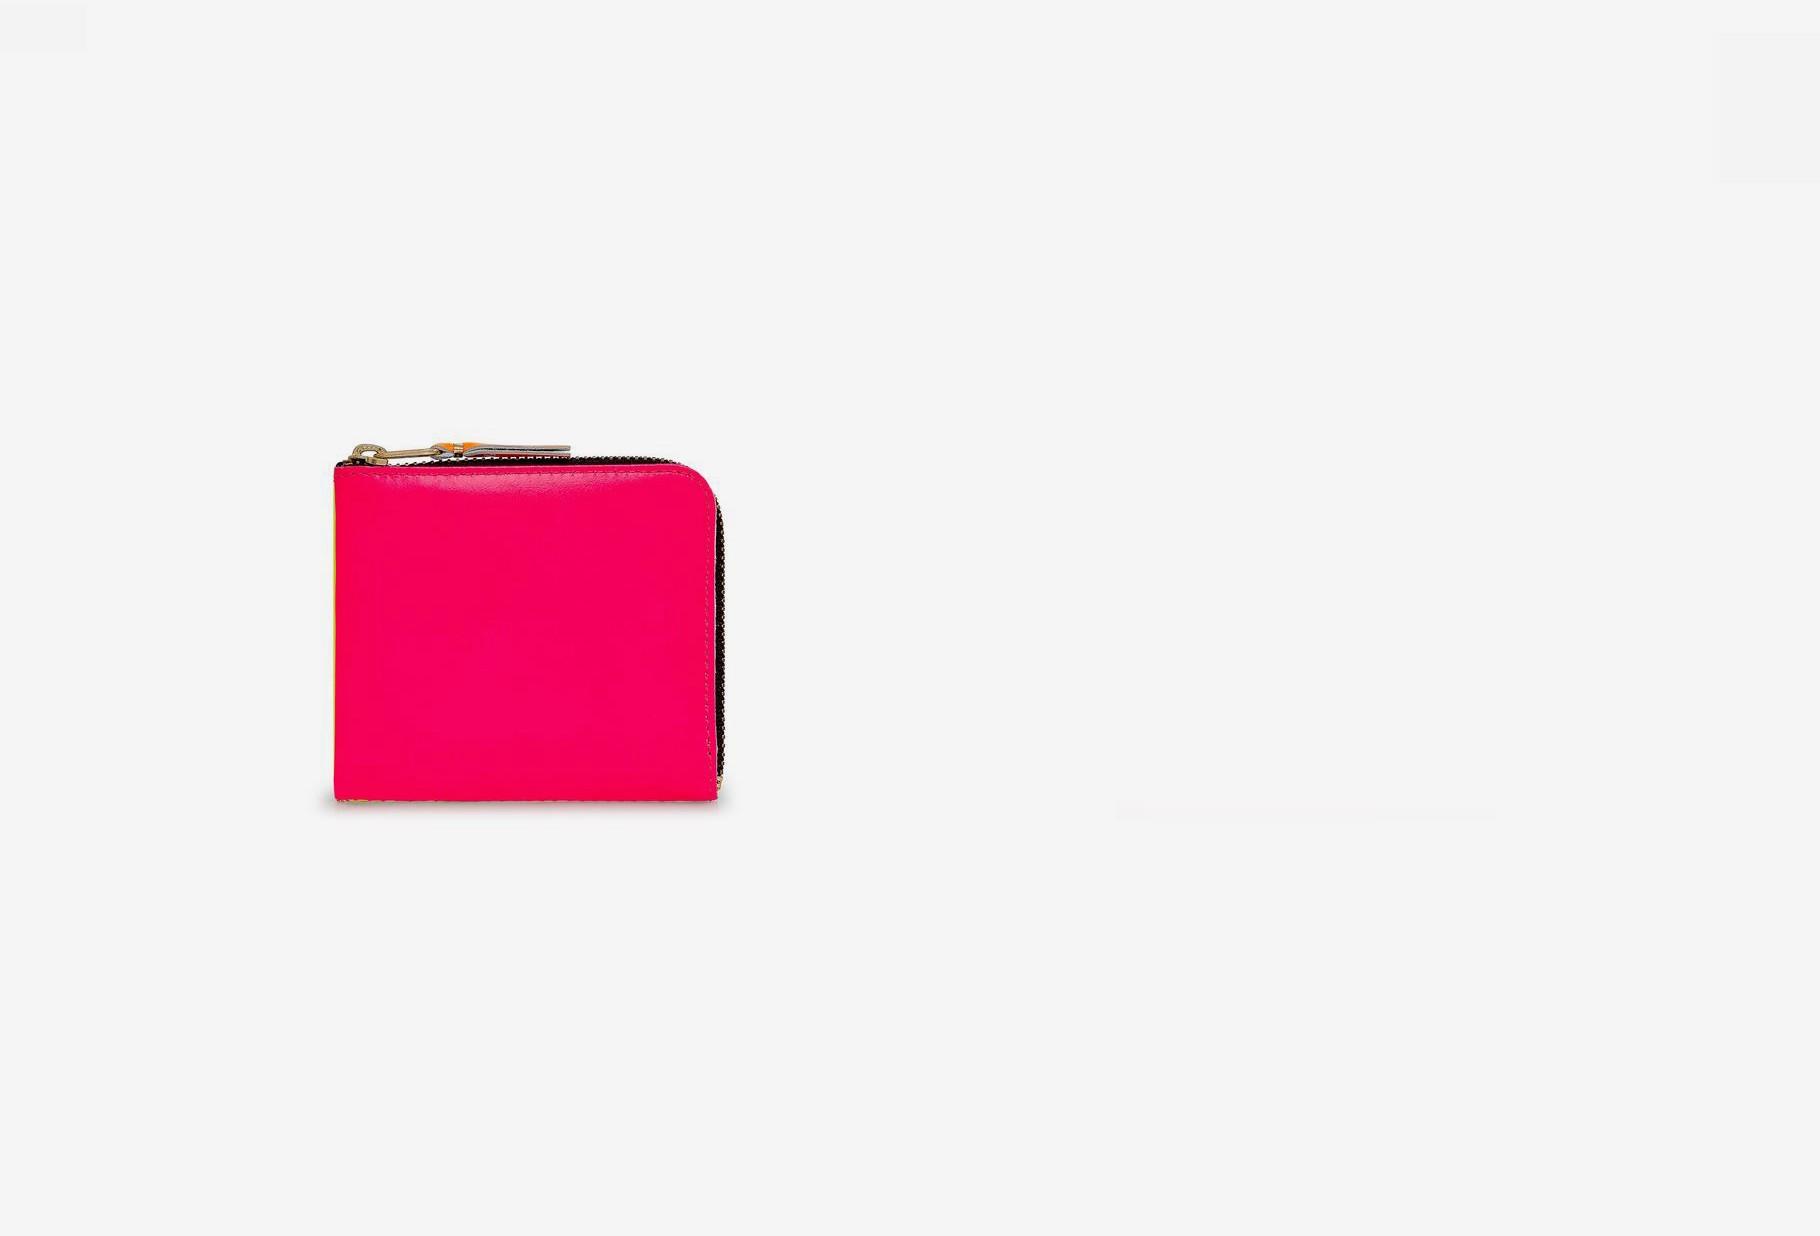 COMME DES GARÇONS WALLETS / Cdg super fluo sa3100sf Pink yellow